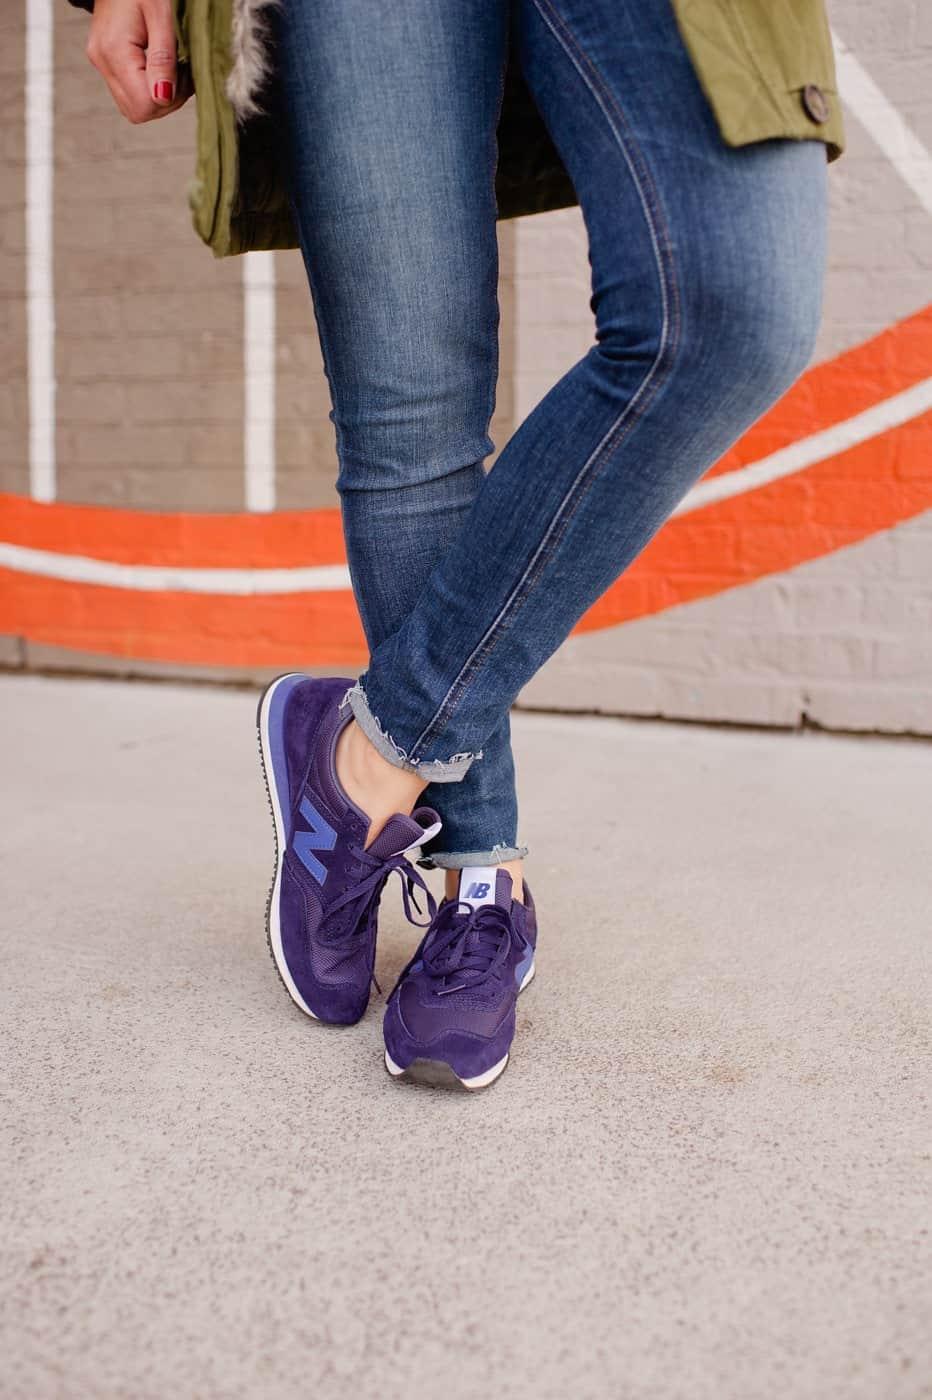 J. Crew Navy New Balance Sneakers For Women - @mystylevita